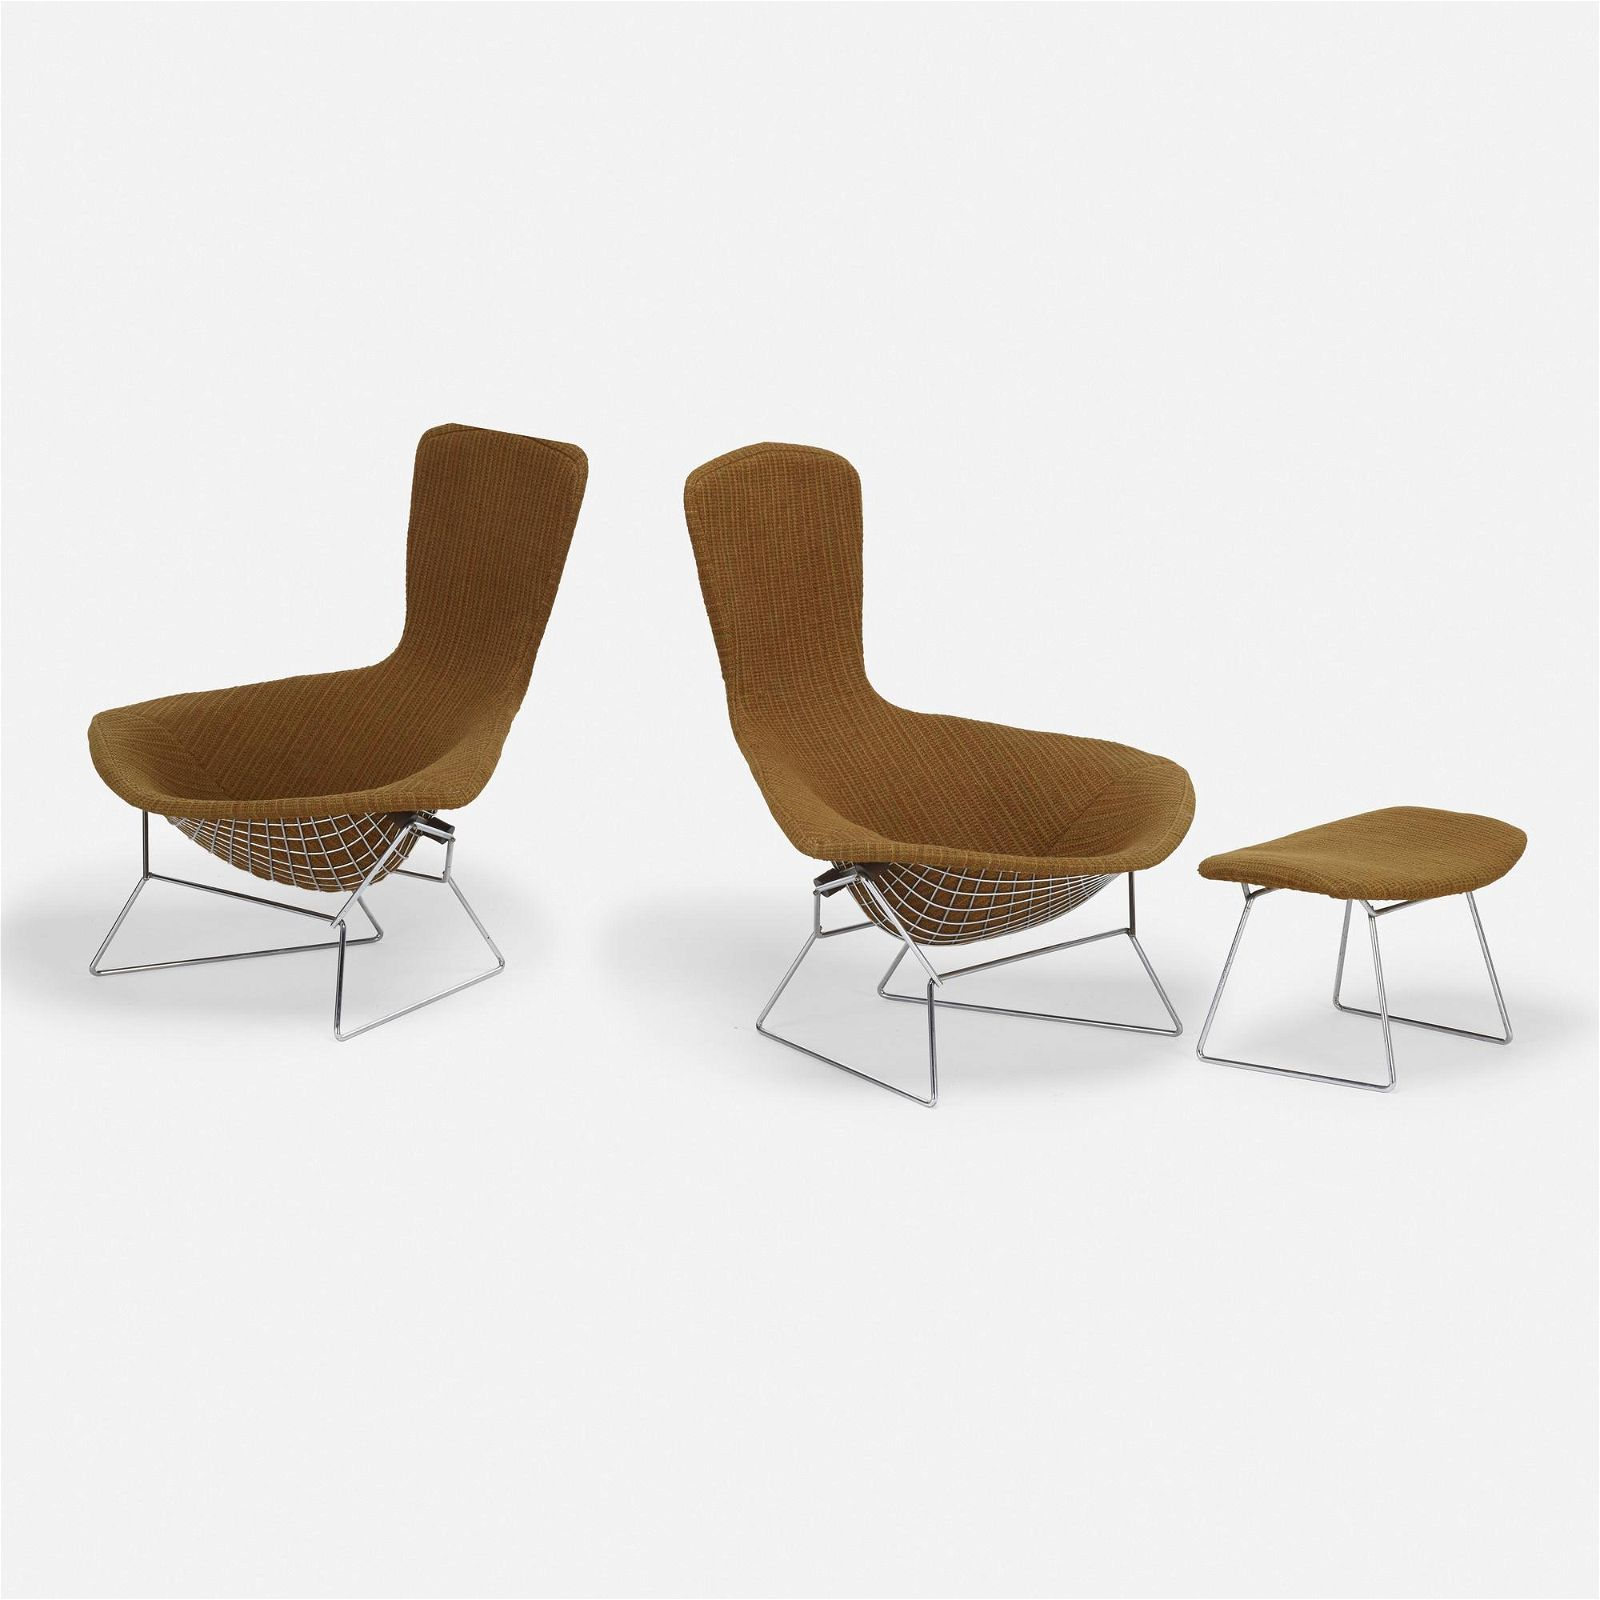 Harry Bertoia, Bird chairs, pair and ottoman